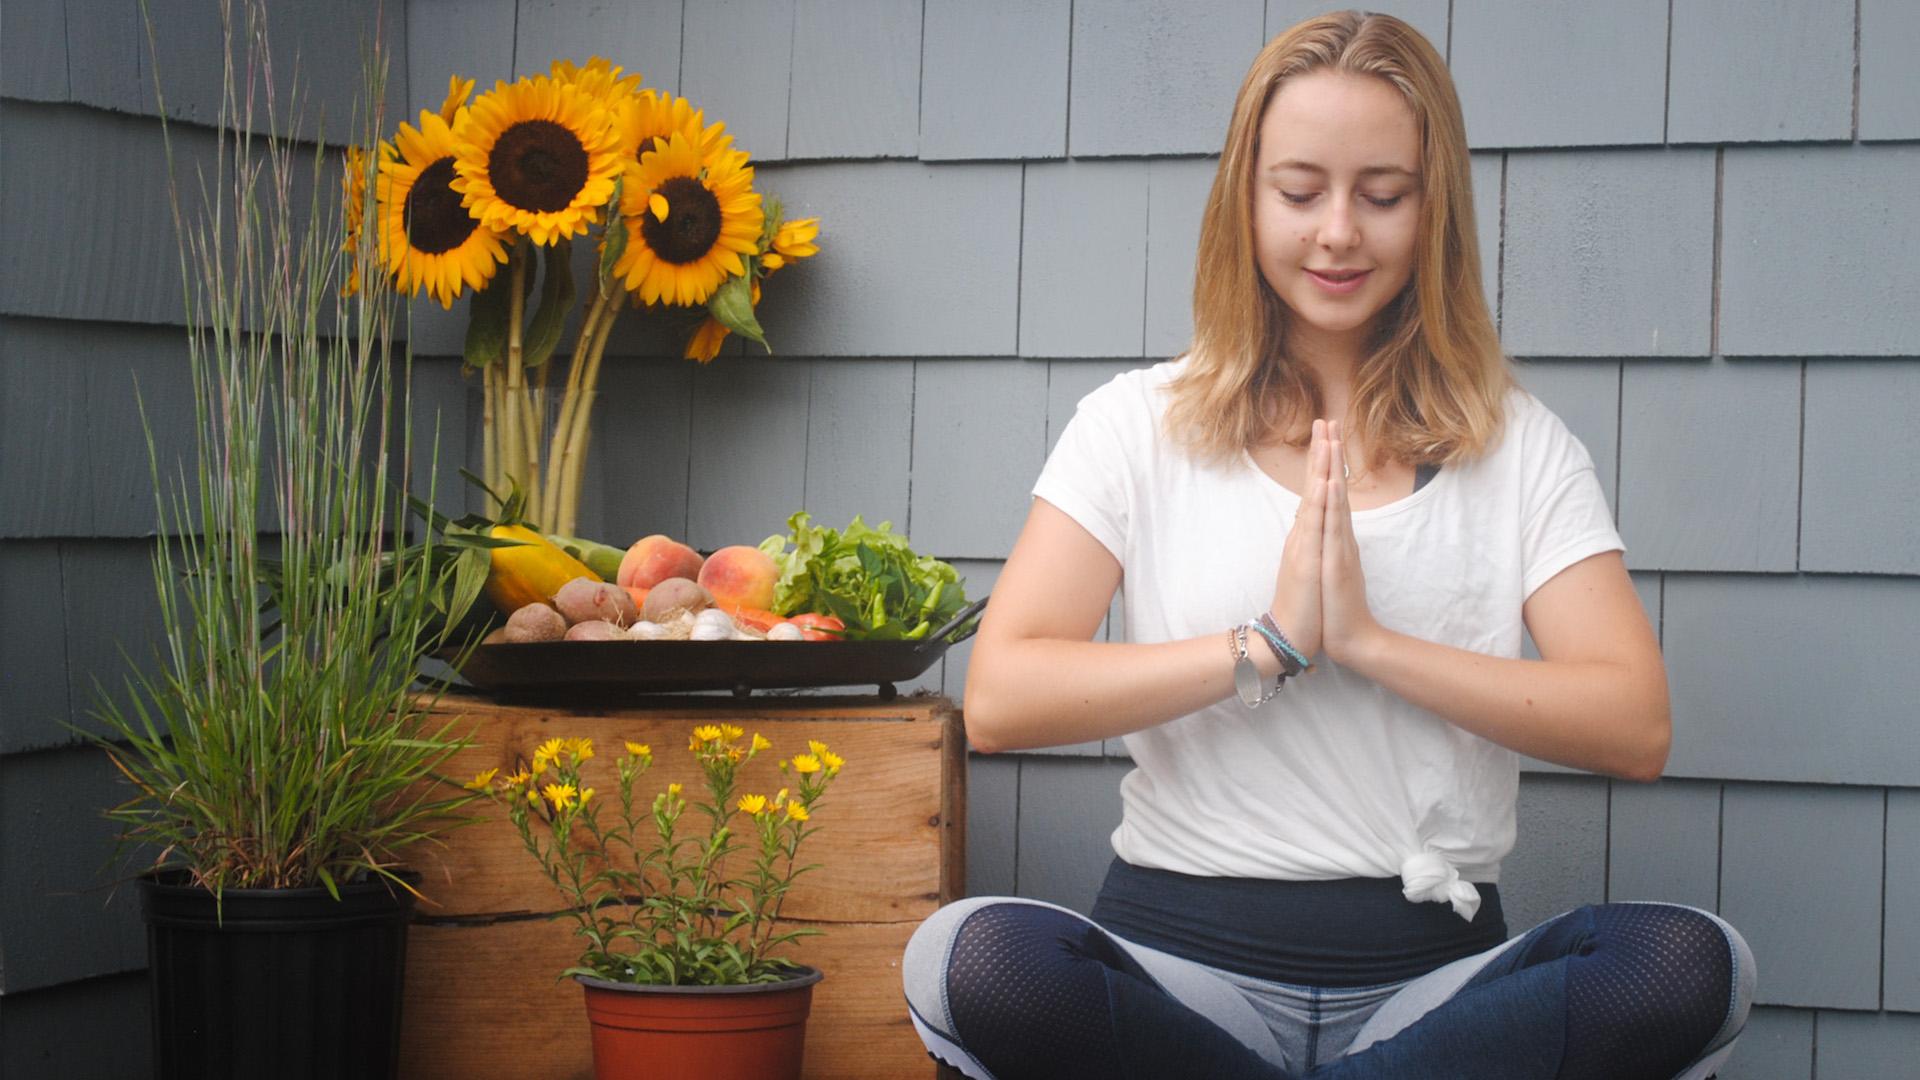 ECI Community Yoga - Mia sunflower 1920x1080.jpg